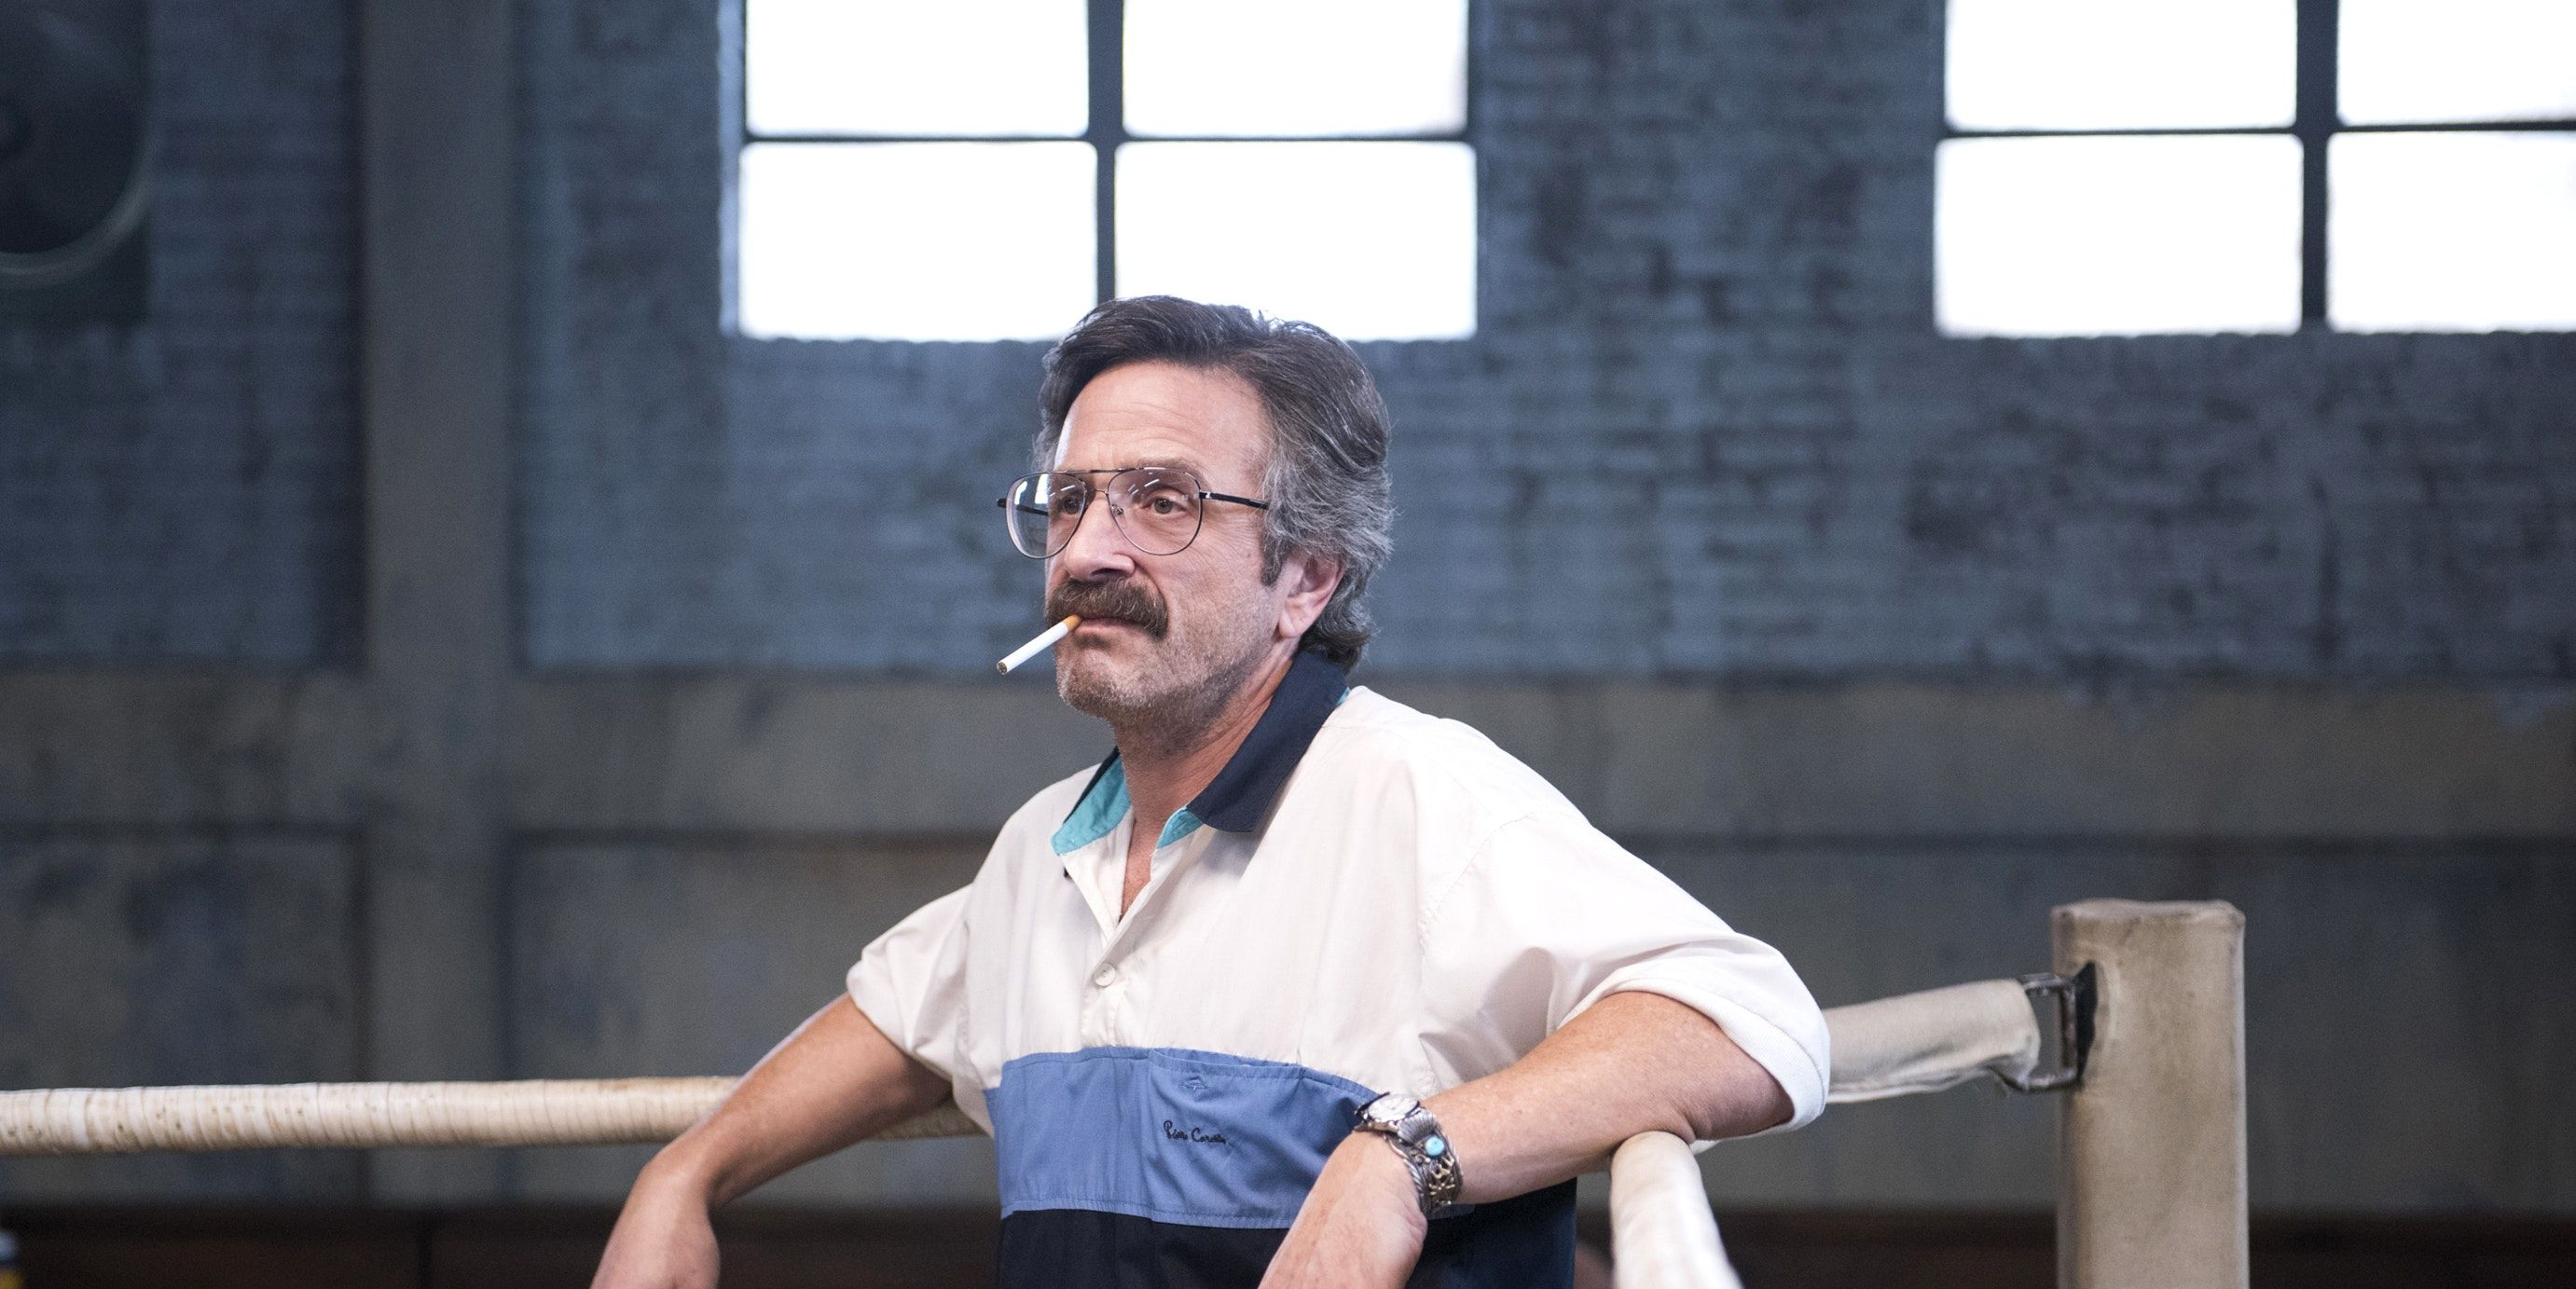 In Netflix S Glow Marc Maron Looks Exactly Like Stan Lee In The